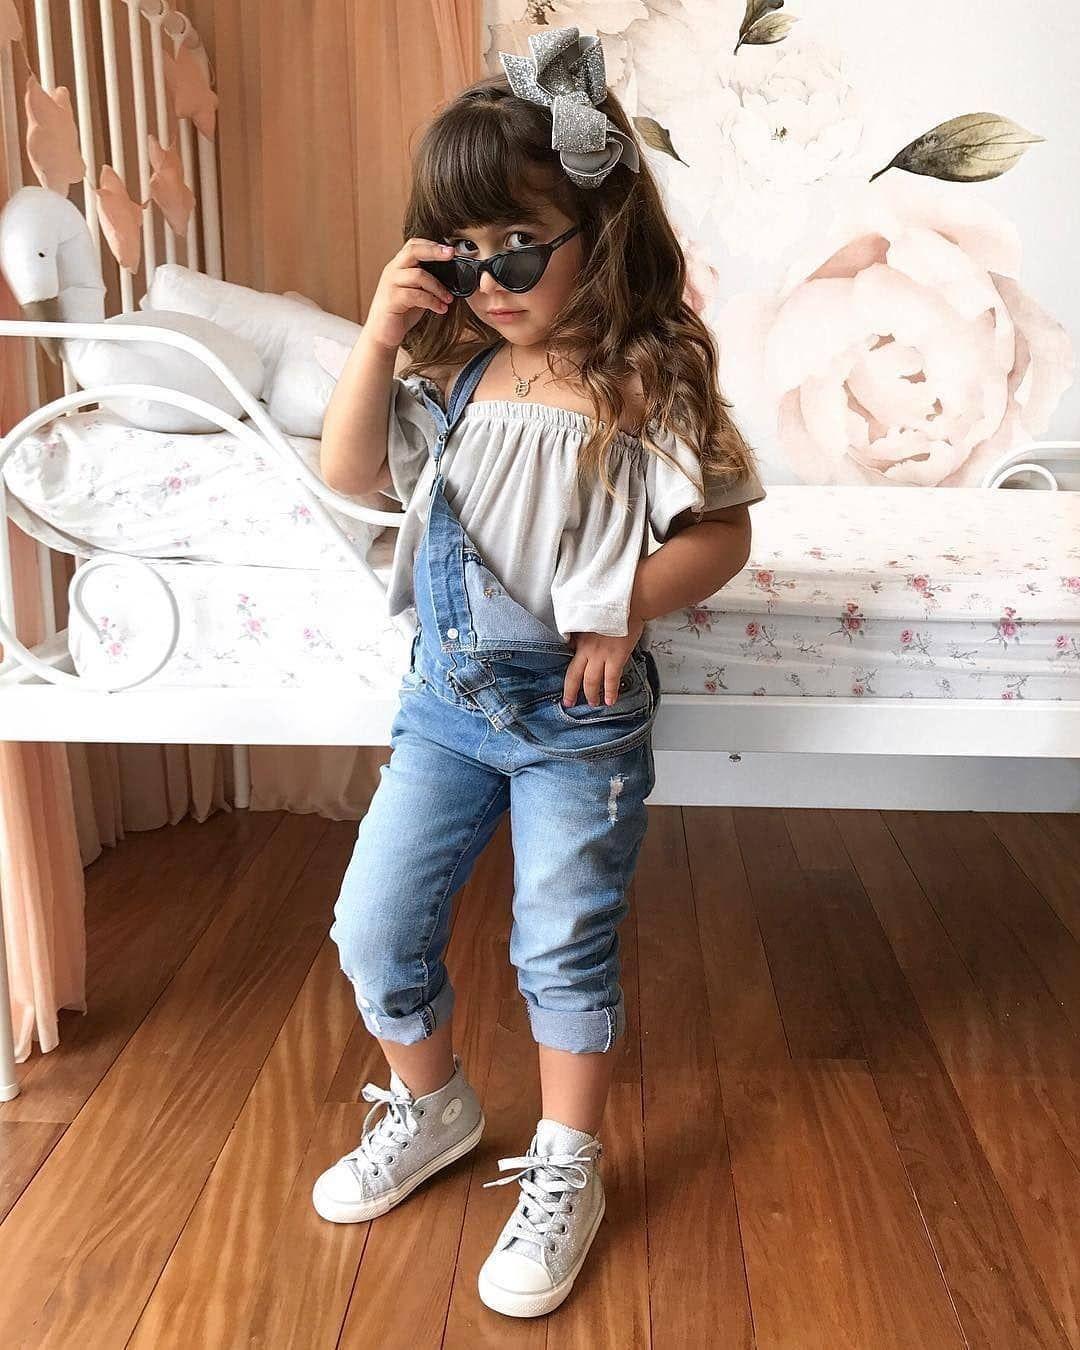 Good Morning Estilosas Moda Para Criancas Moda Infantil